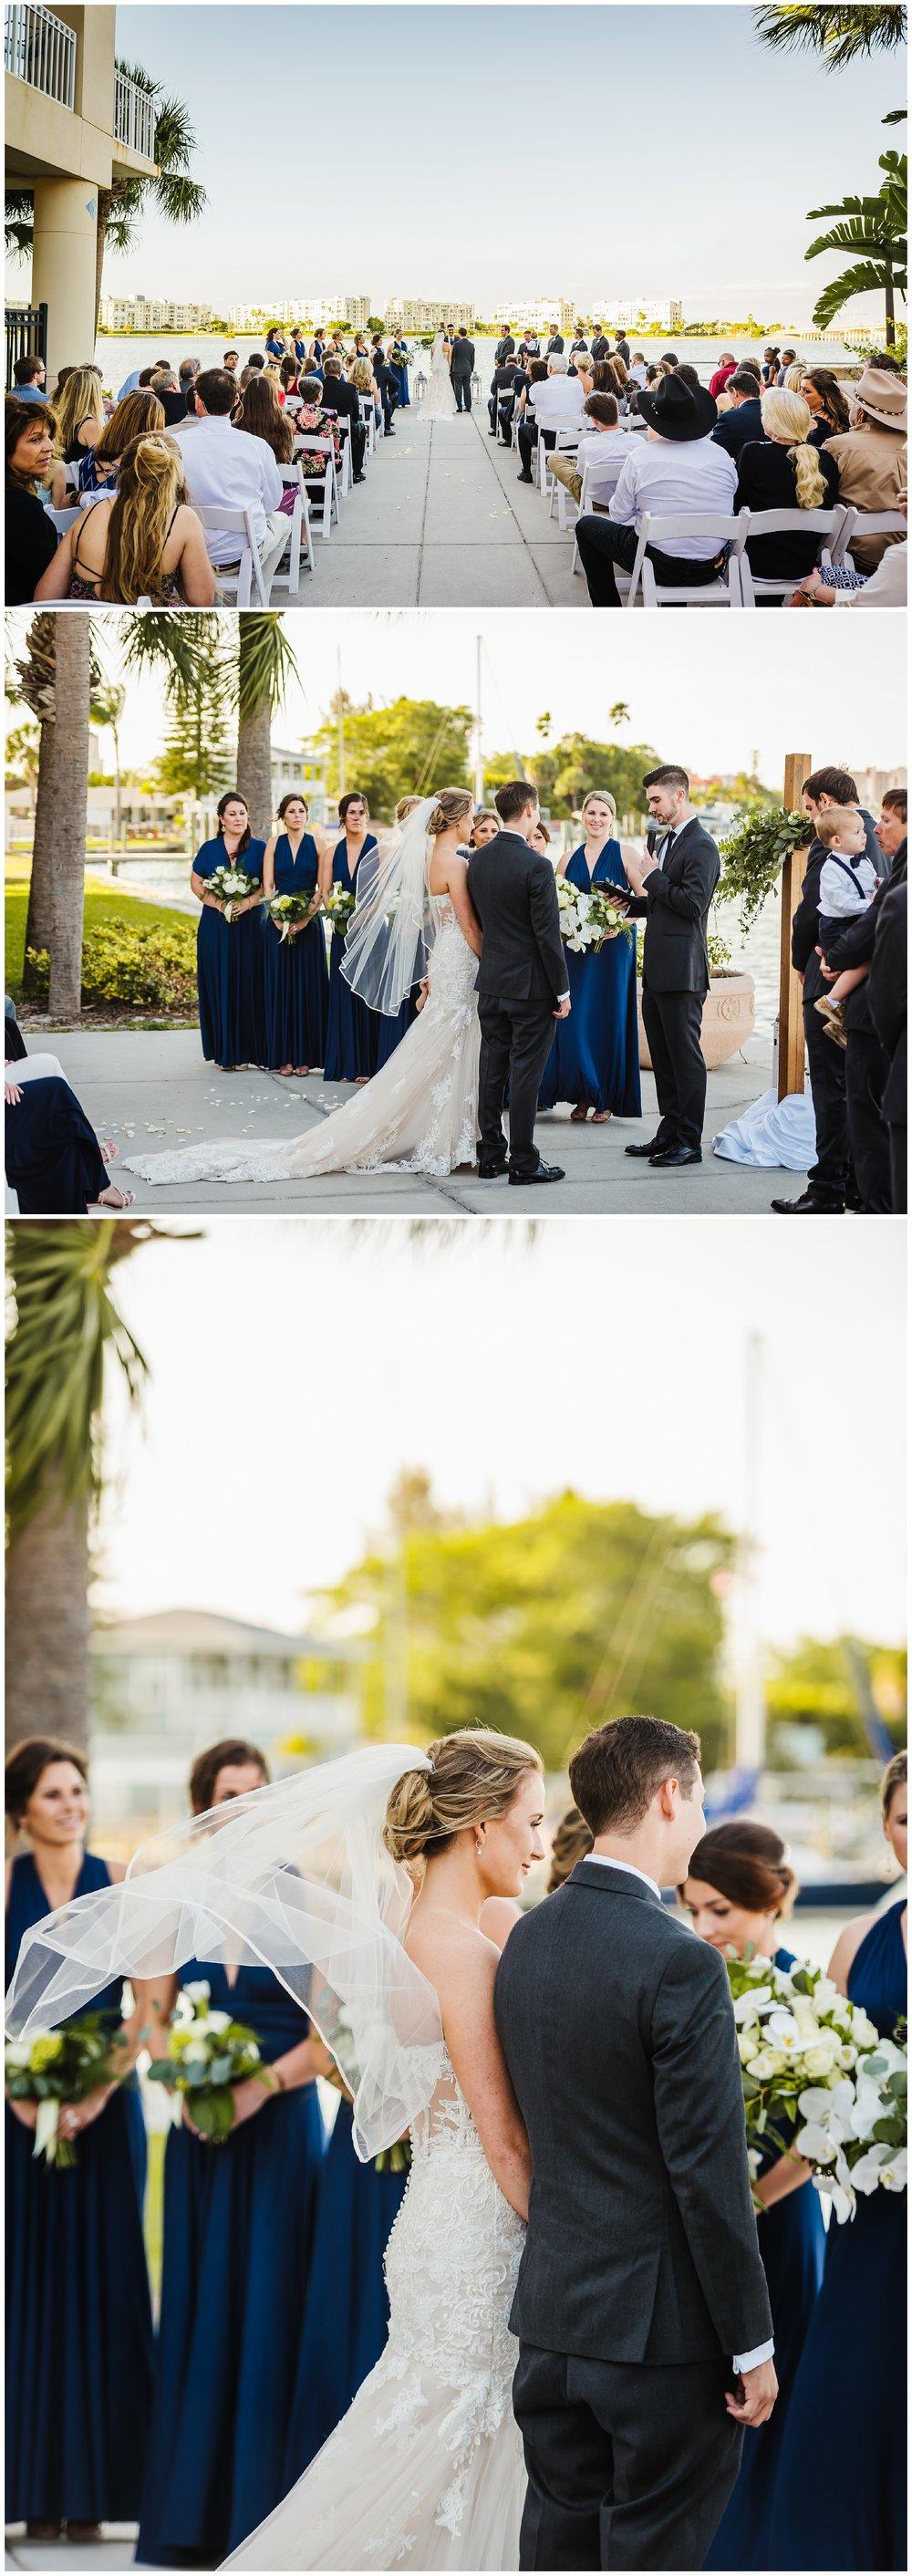 Tampa-wedding-photographer-bella-fleur-orchid-boquet-rsvb-events_0017.jpg